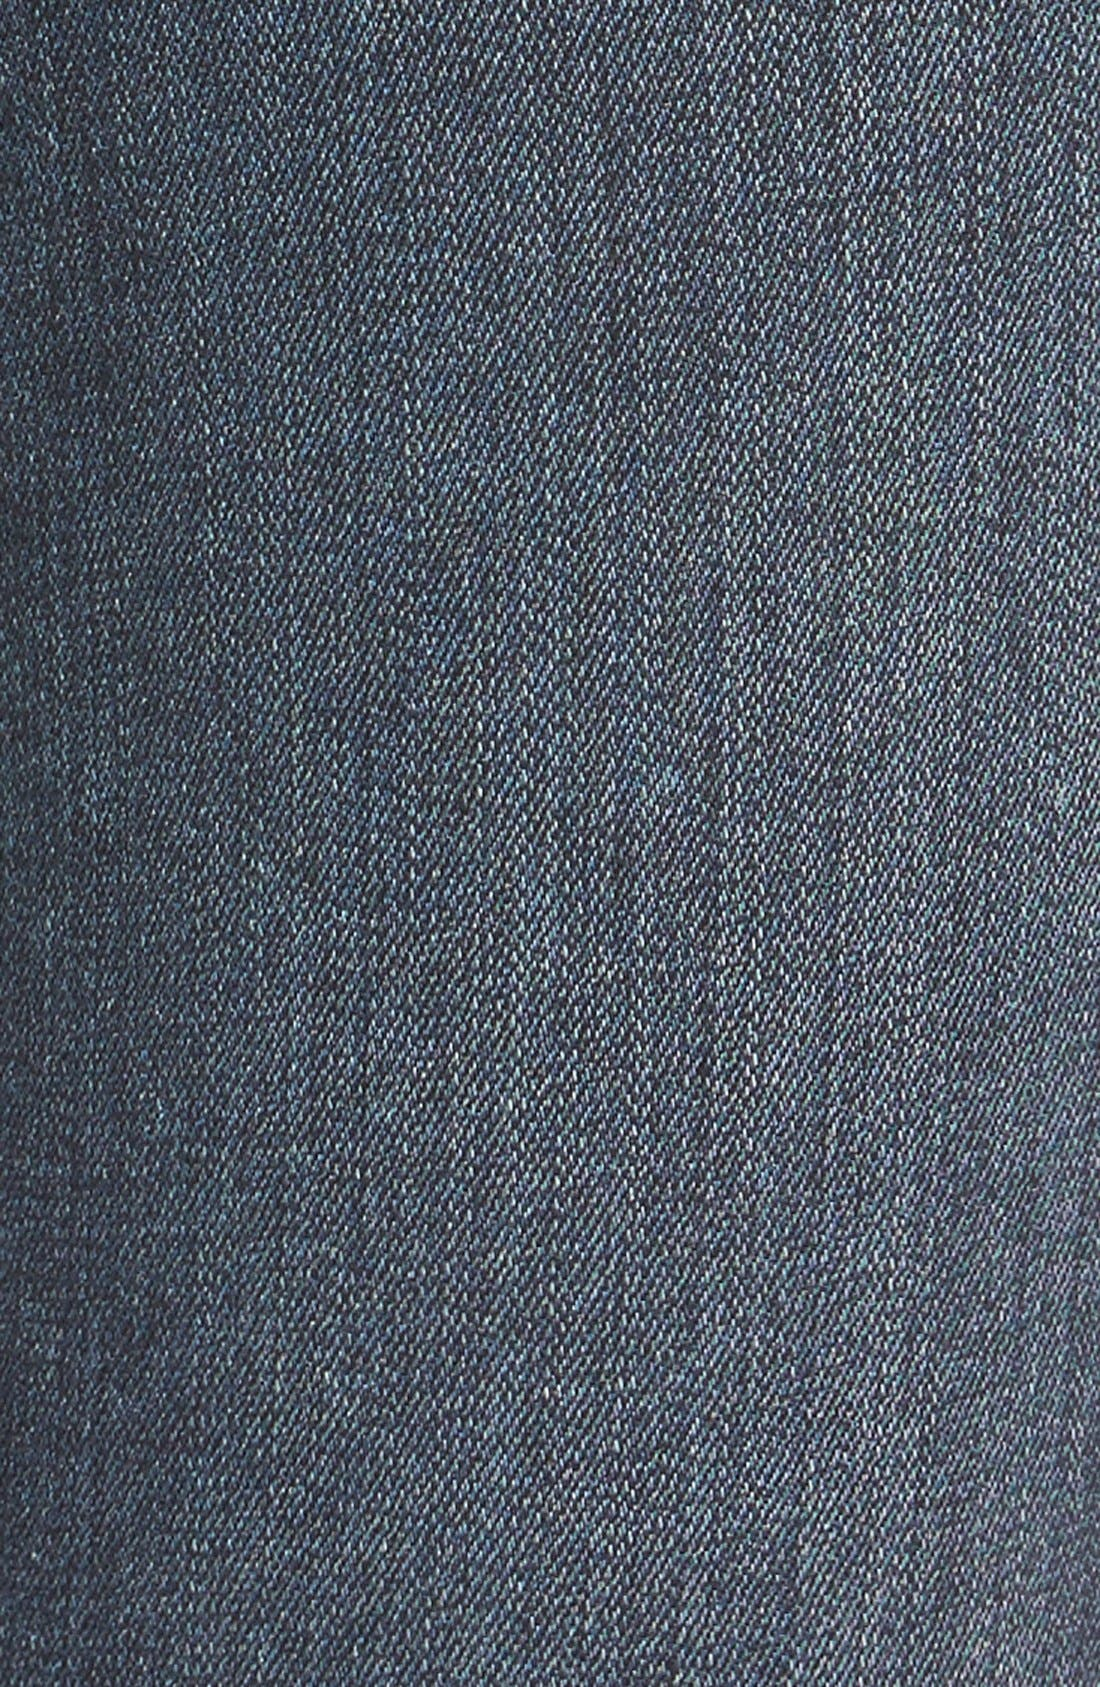 Transcend Skyline Skinny Jeans,                             Alternate thumbnail 4, color,                             BRENTYN